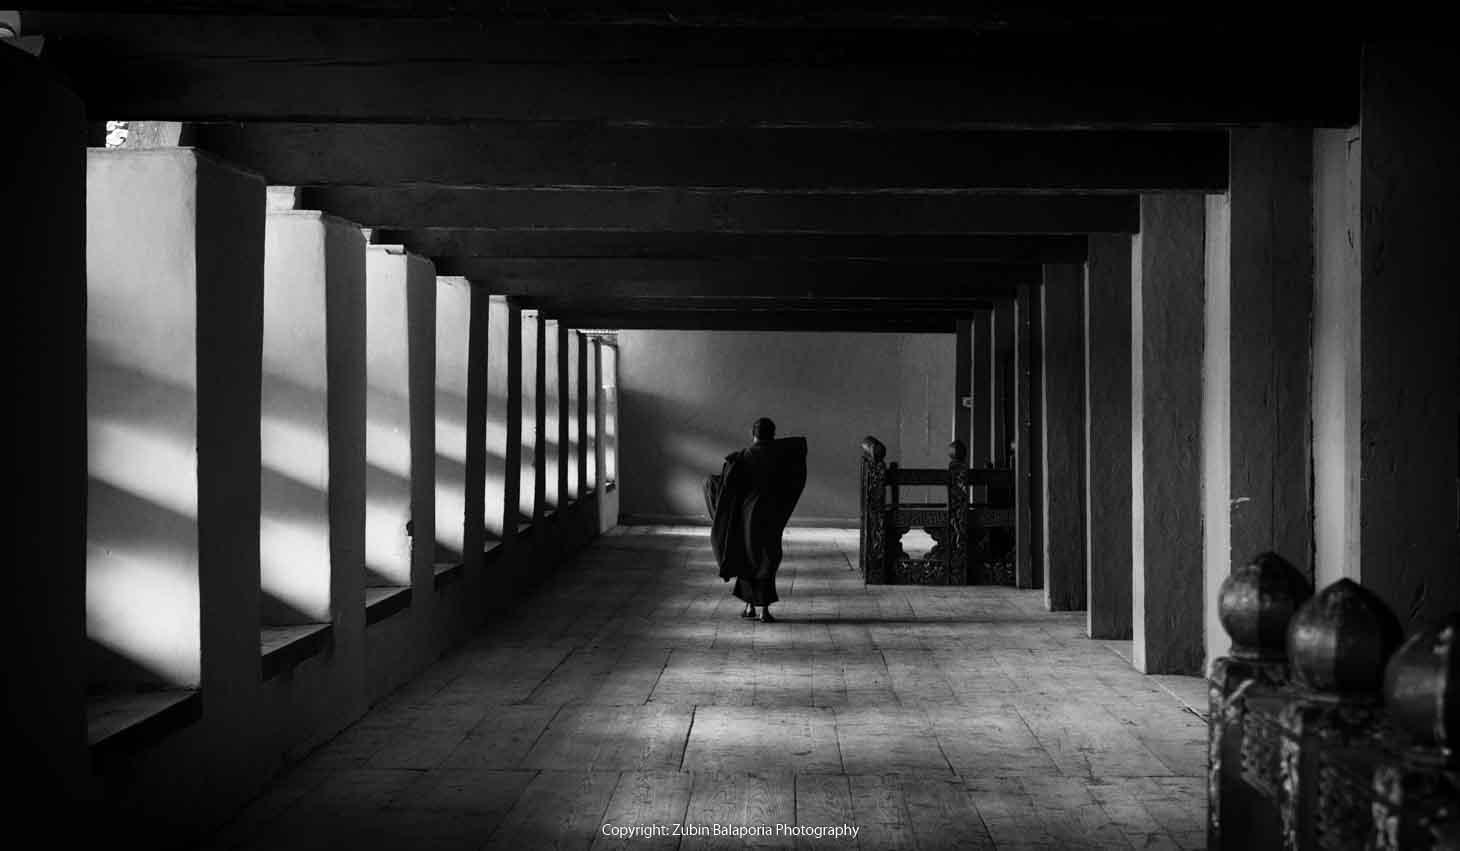 The Shrouded Pillar Monk